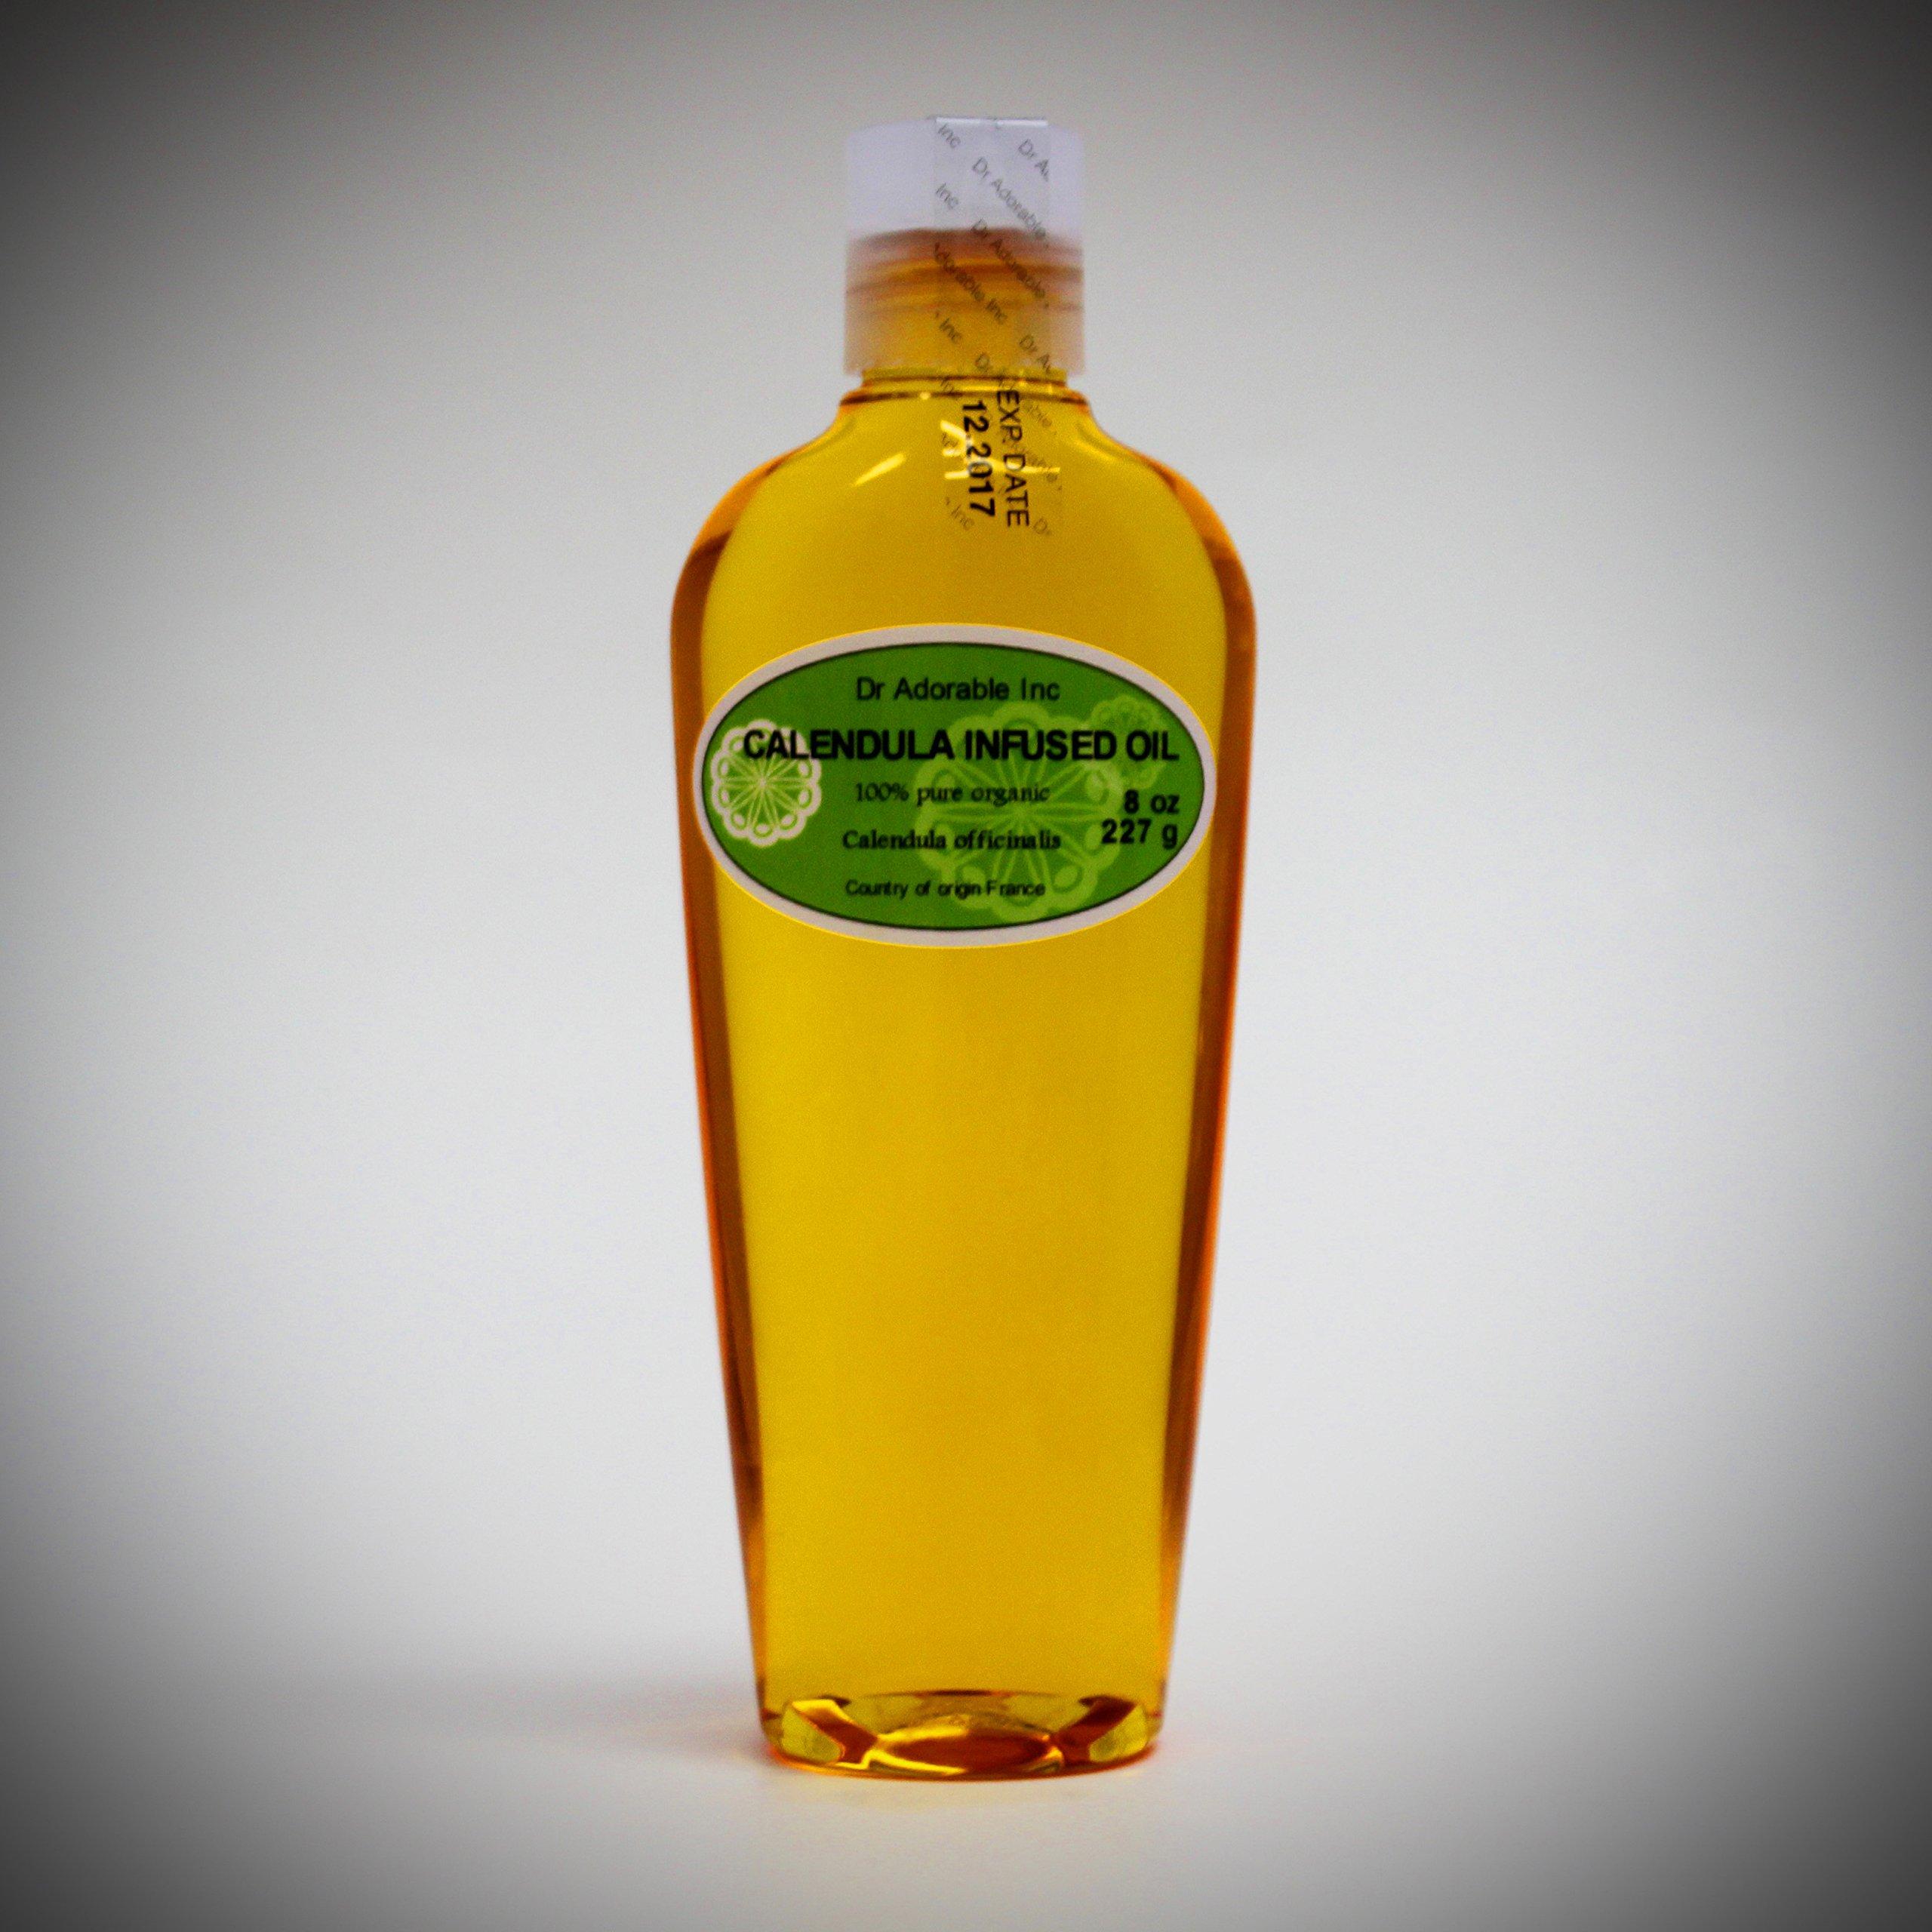 8 Oz Organic Calendula Infused Oil 100% Pure